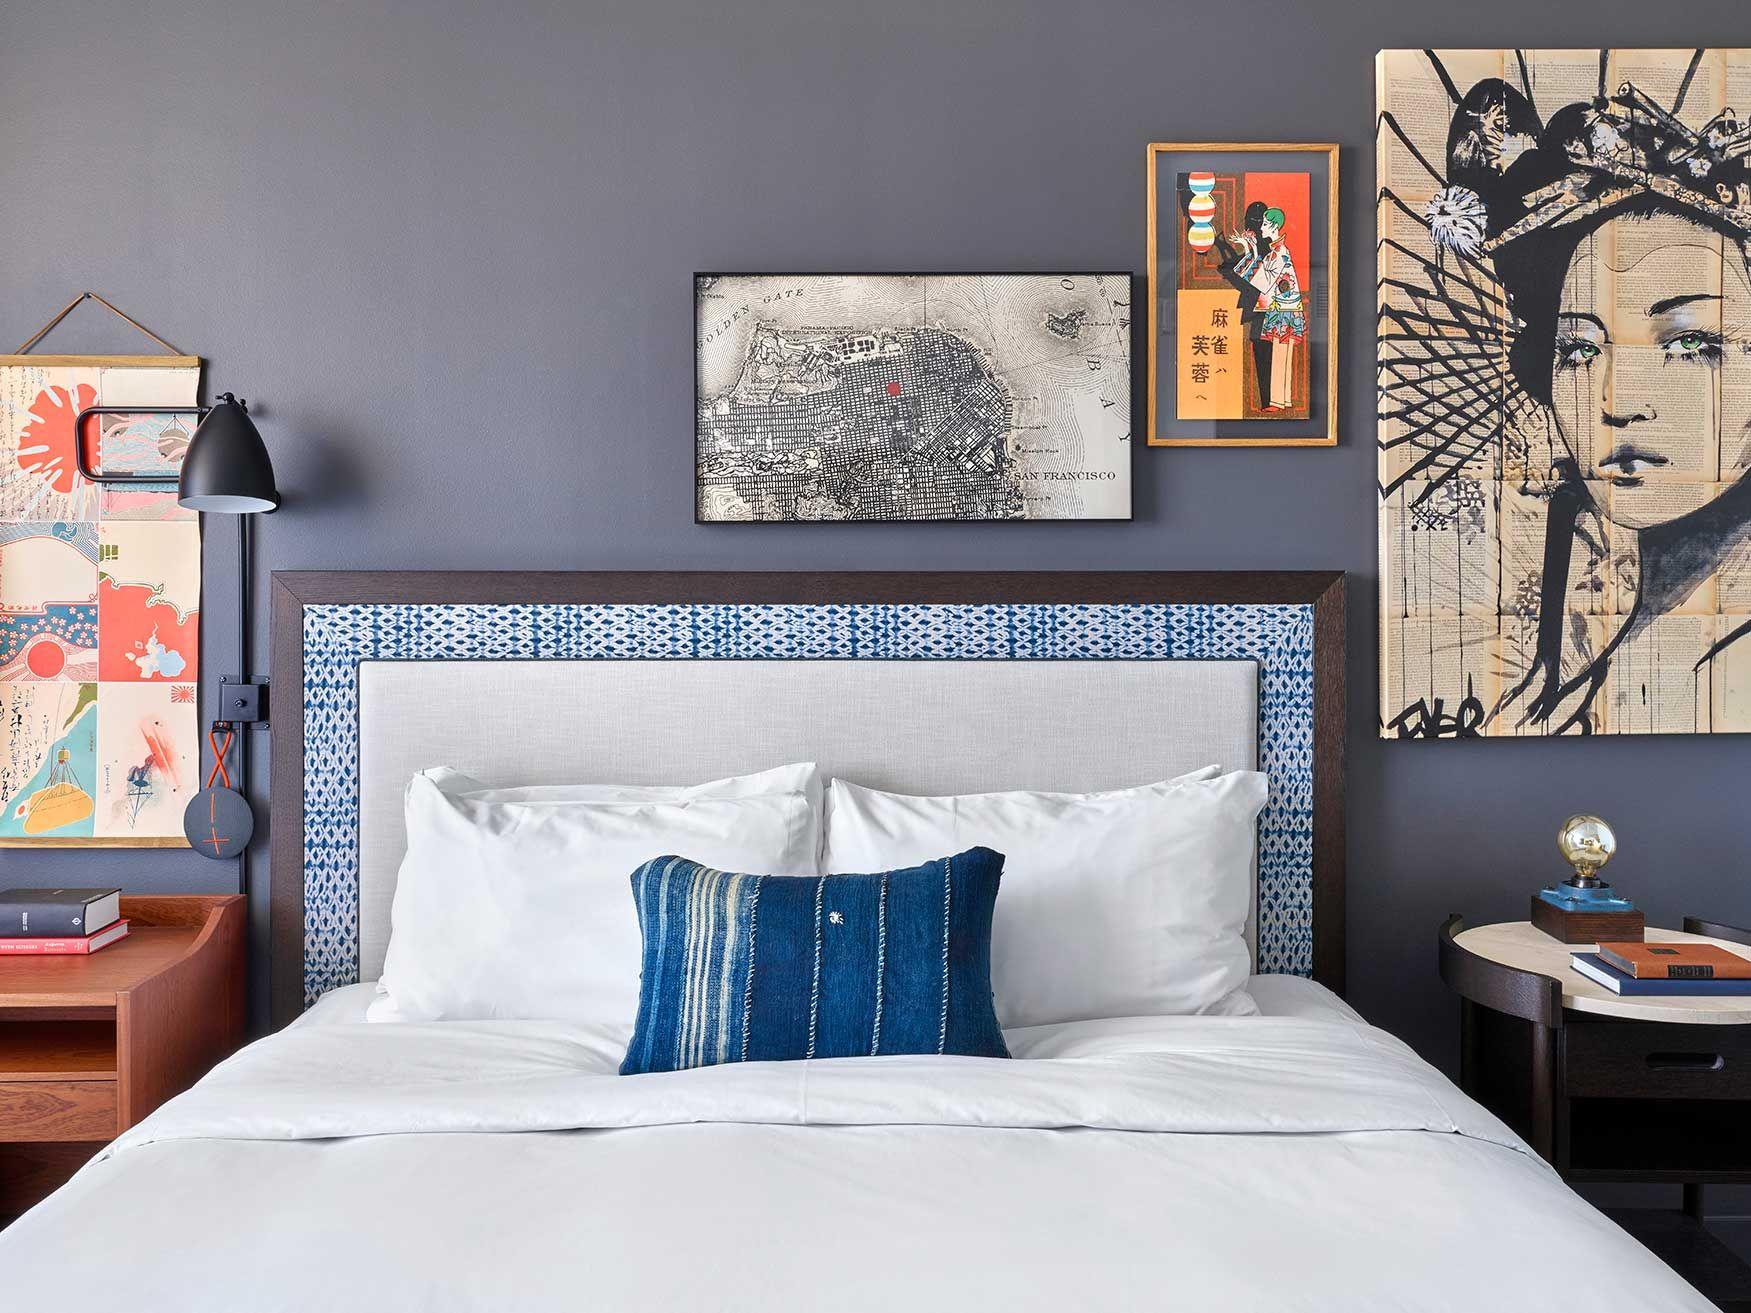 MARKZEFF_Hotel_Kabuki_24 Design Milk Bed pillows